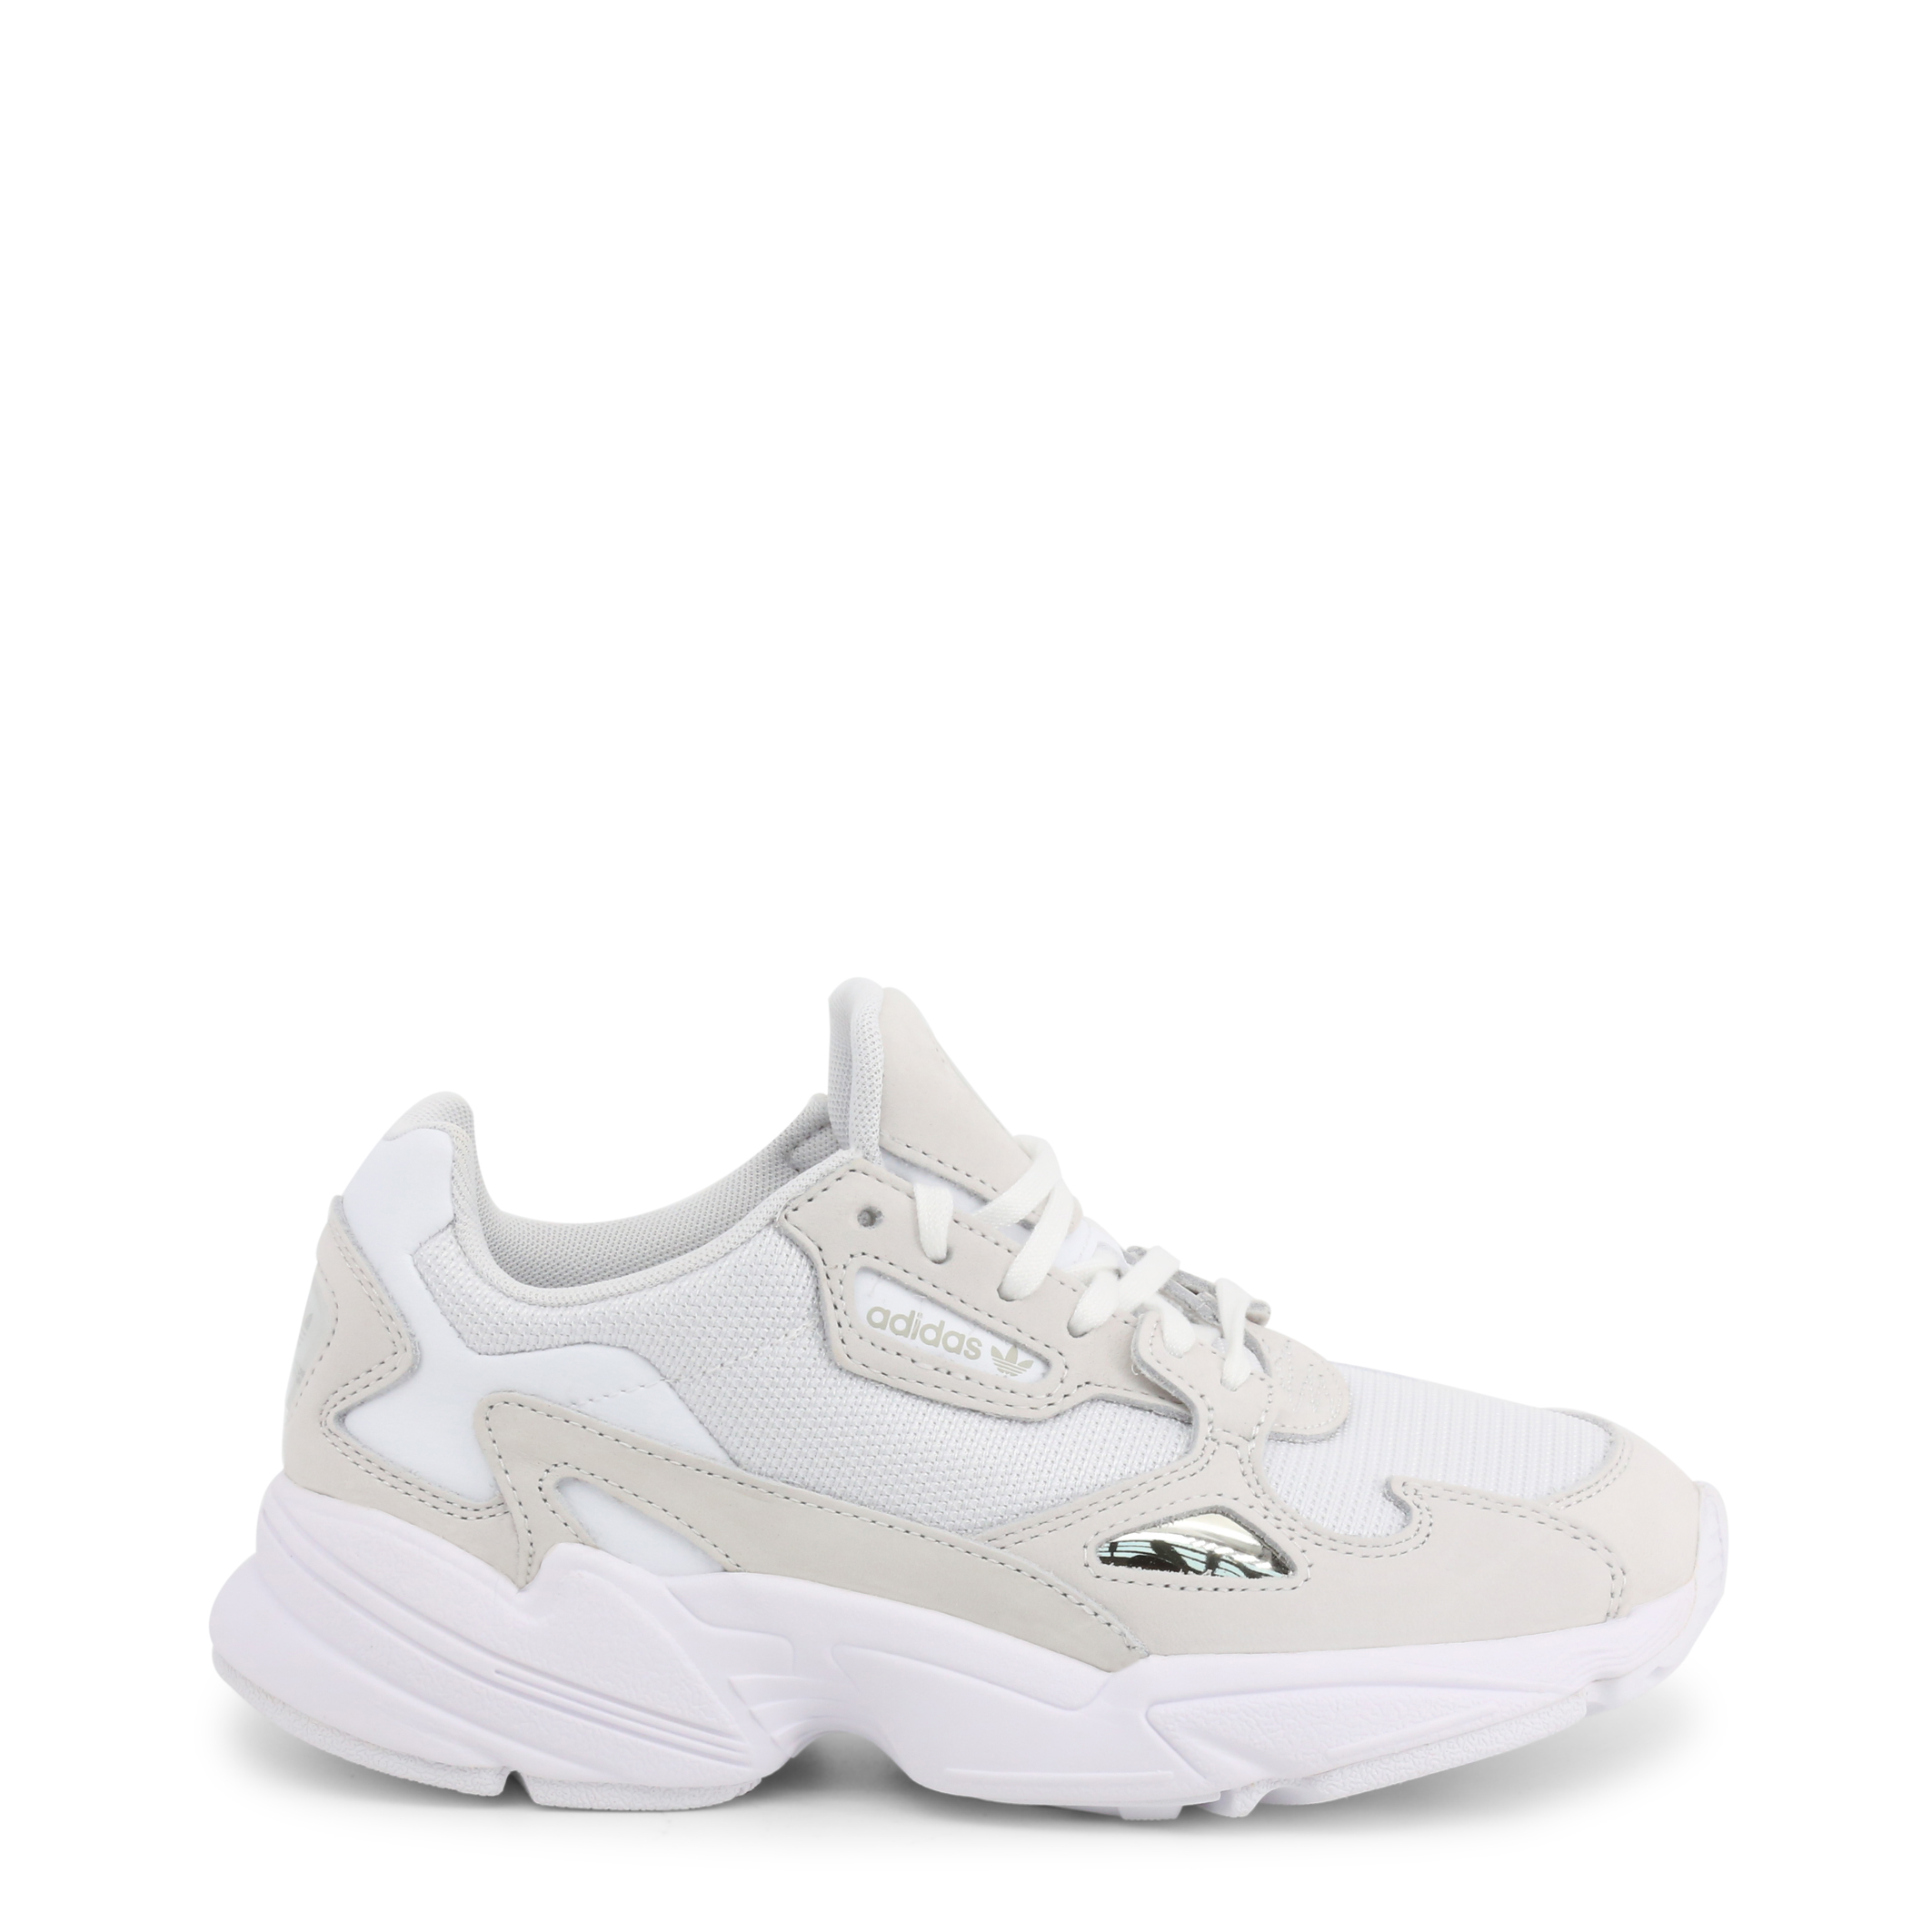 Chaussures  Adidas FALCON white